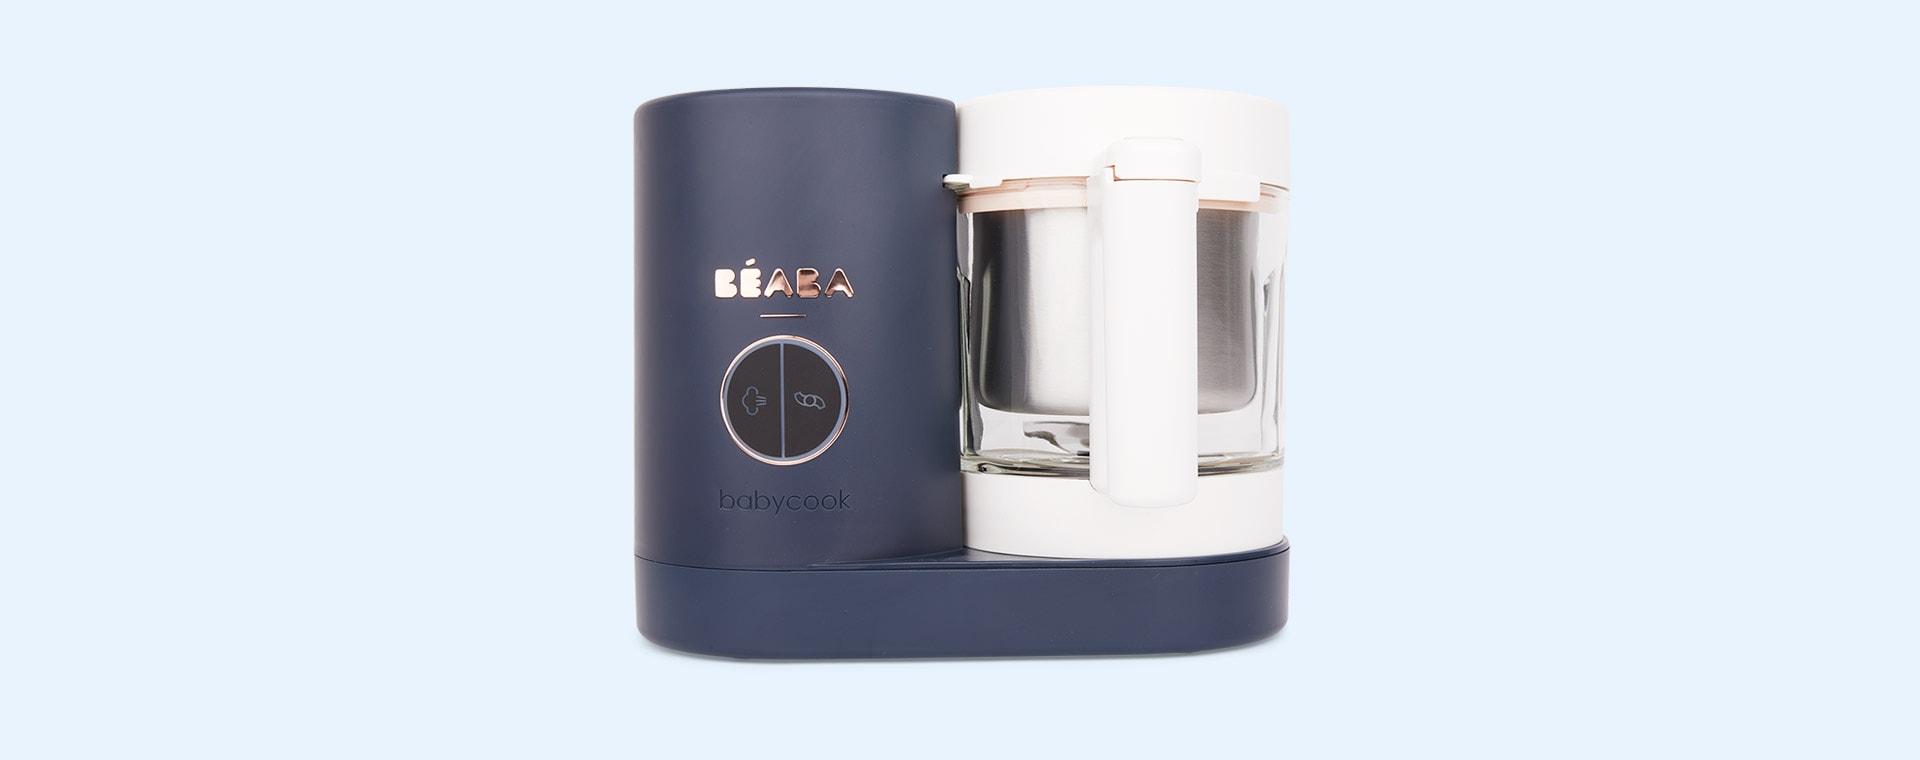 Night Blue Beaba Babycook Neo Baby Food Steamer Blender